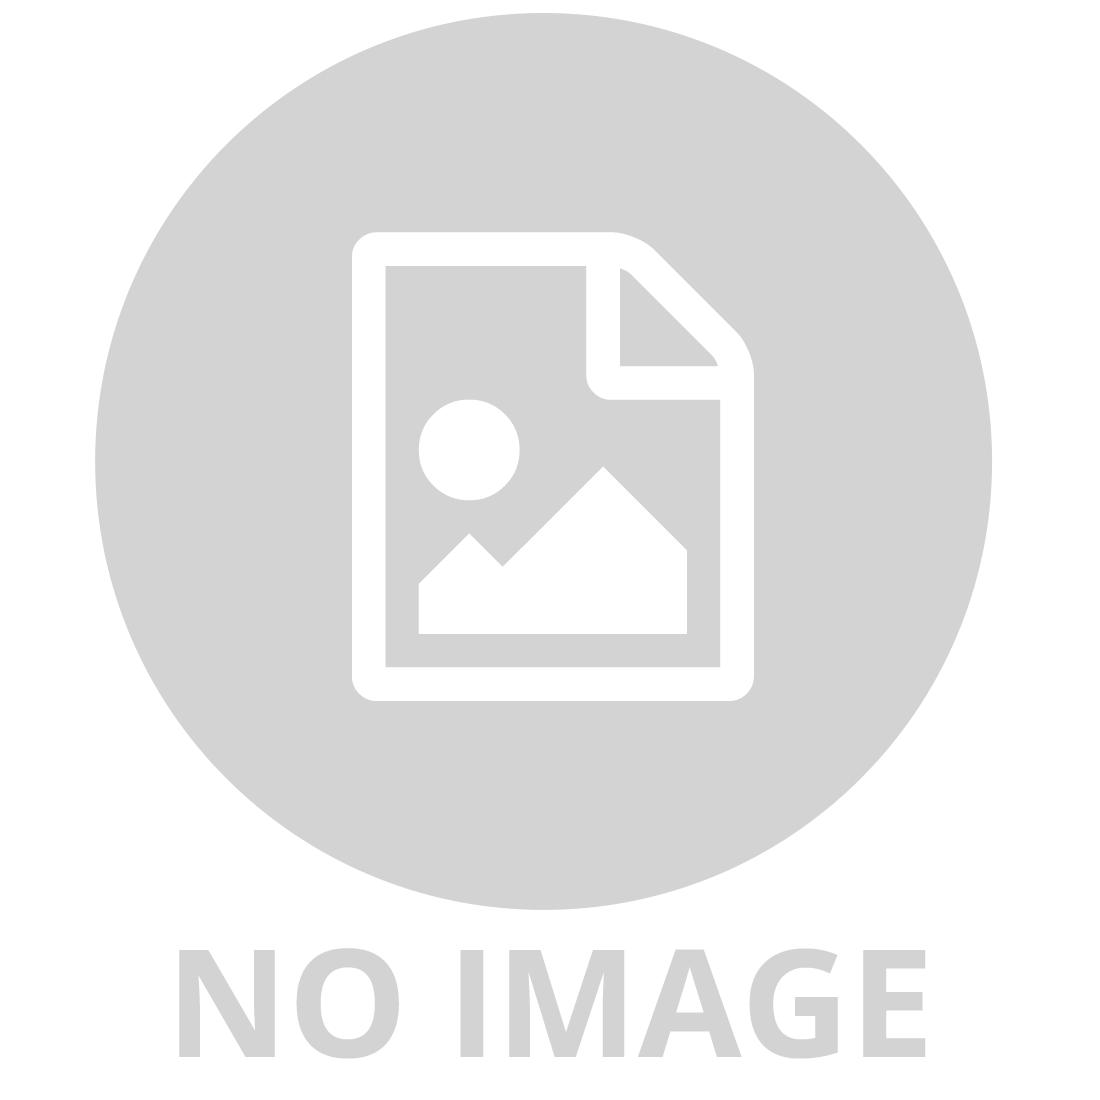 LEGO MARVEL 76133 SPIDER-MAN CAR CHASE